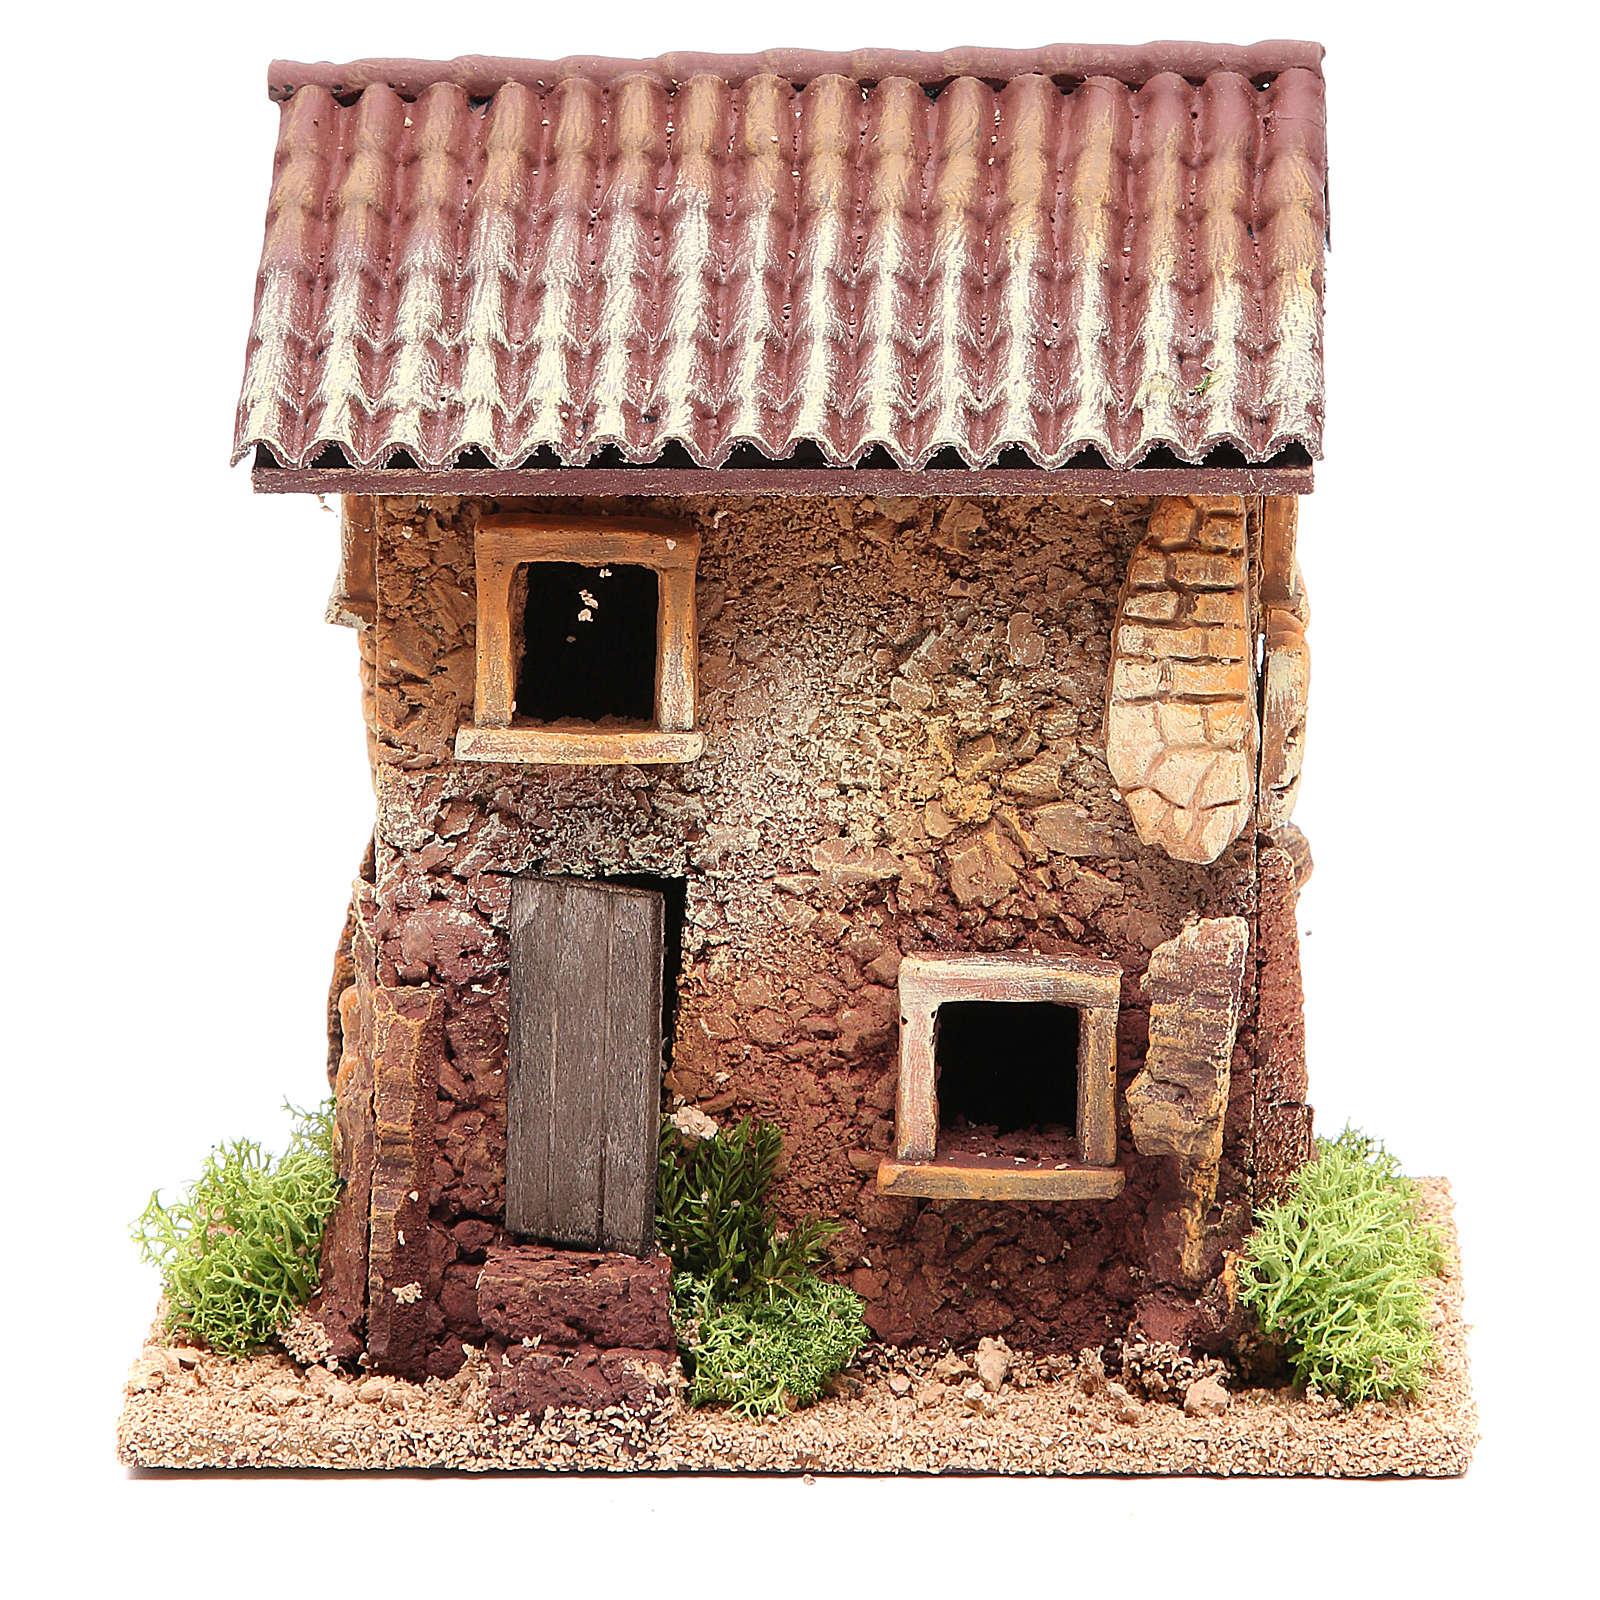 Casa presepe sughero 18x18x13 cm 4